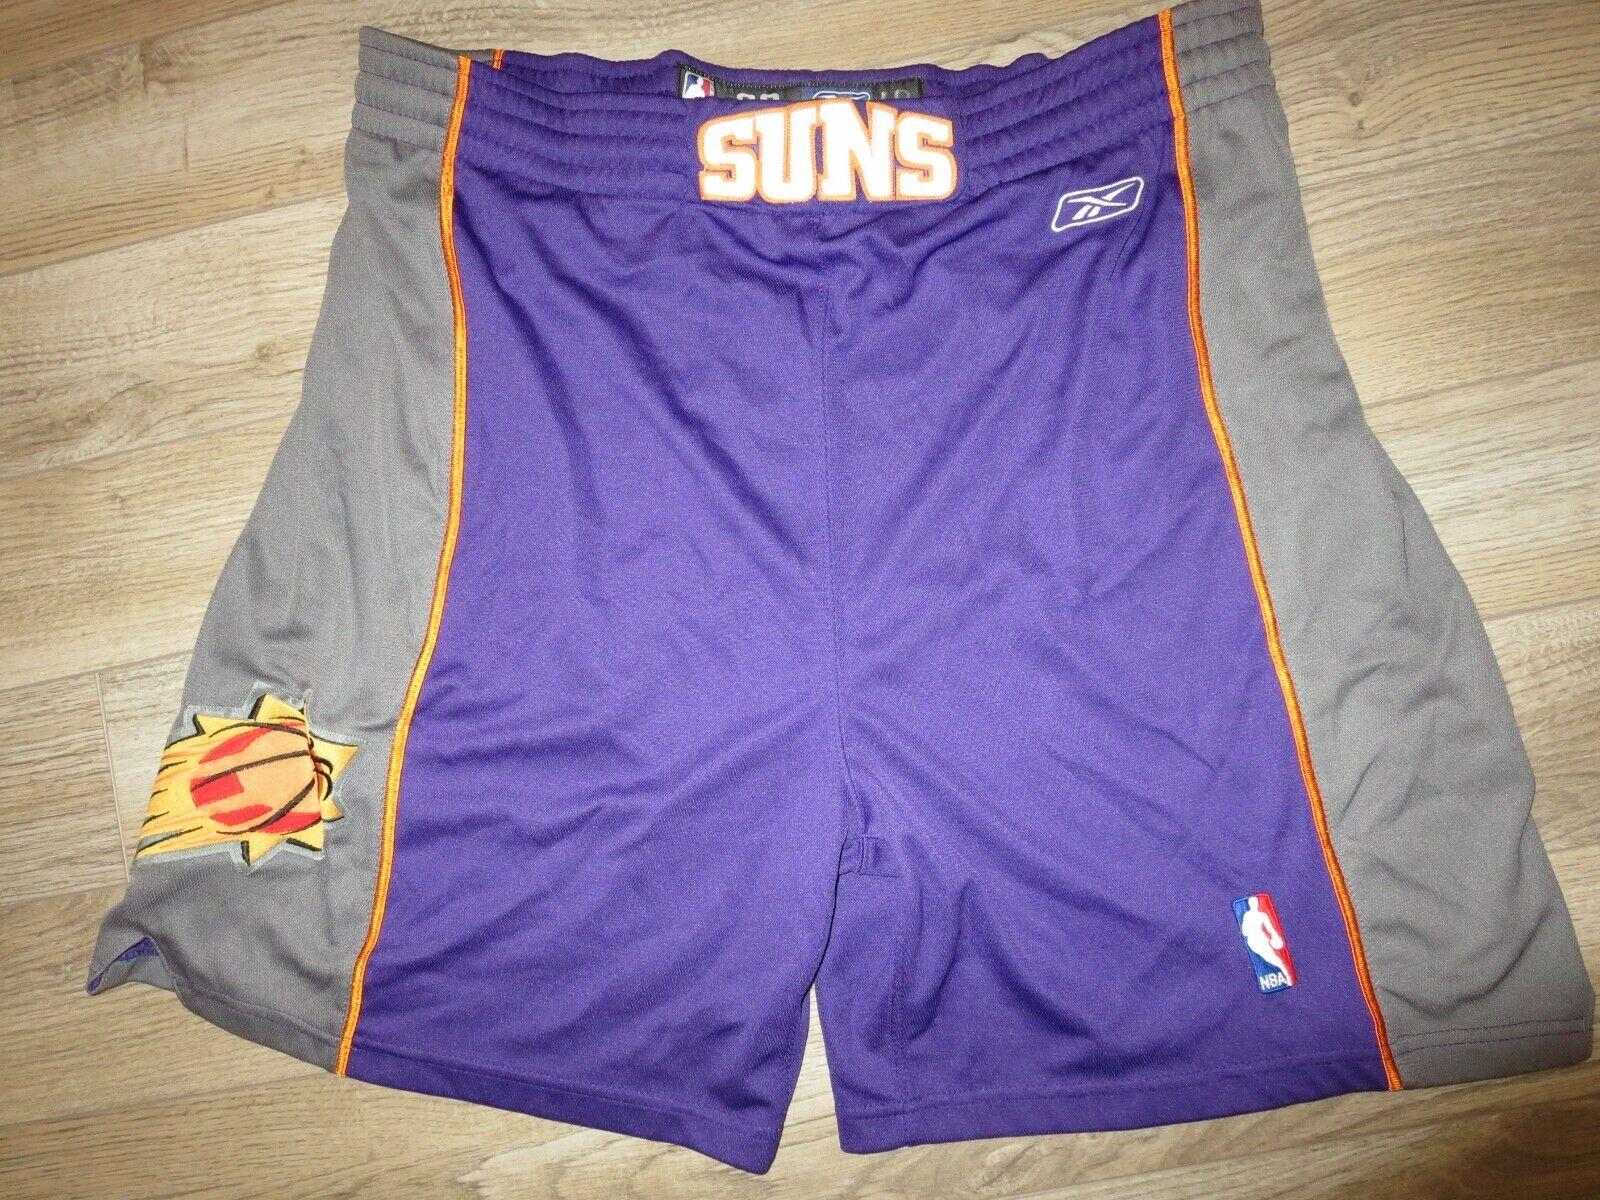 Phoenix Suns NBA Reebok Game Worn Used Basketball courtes 36